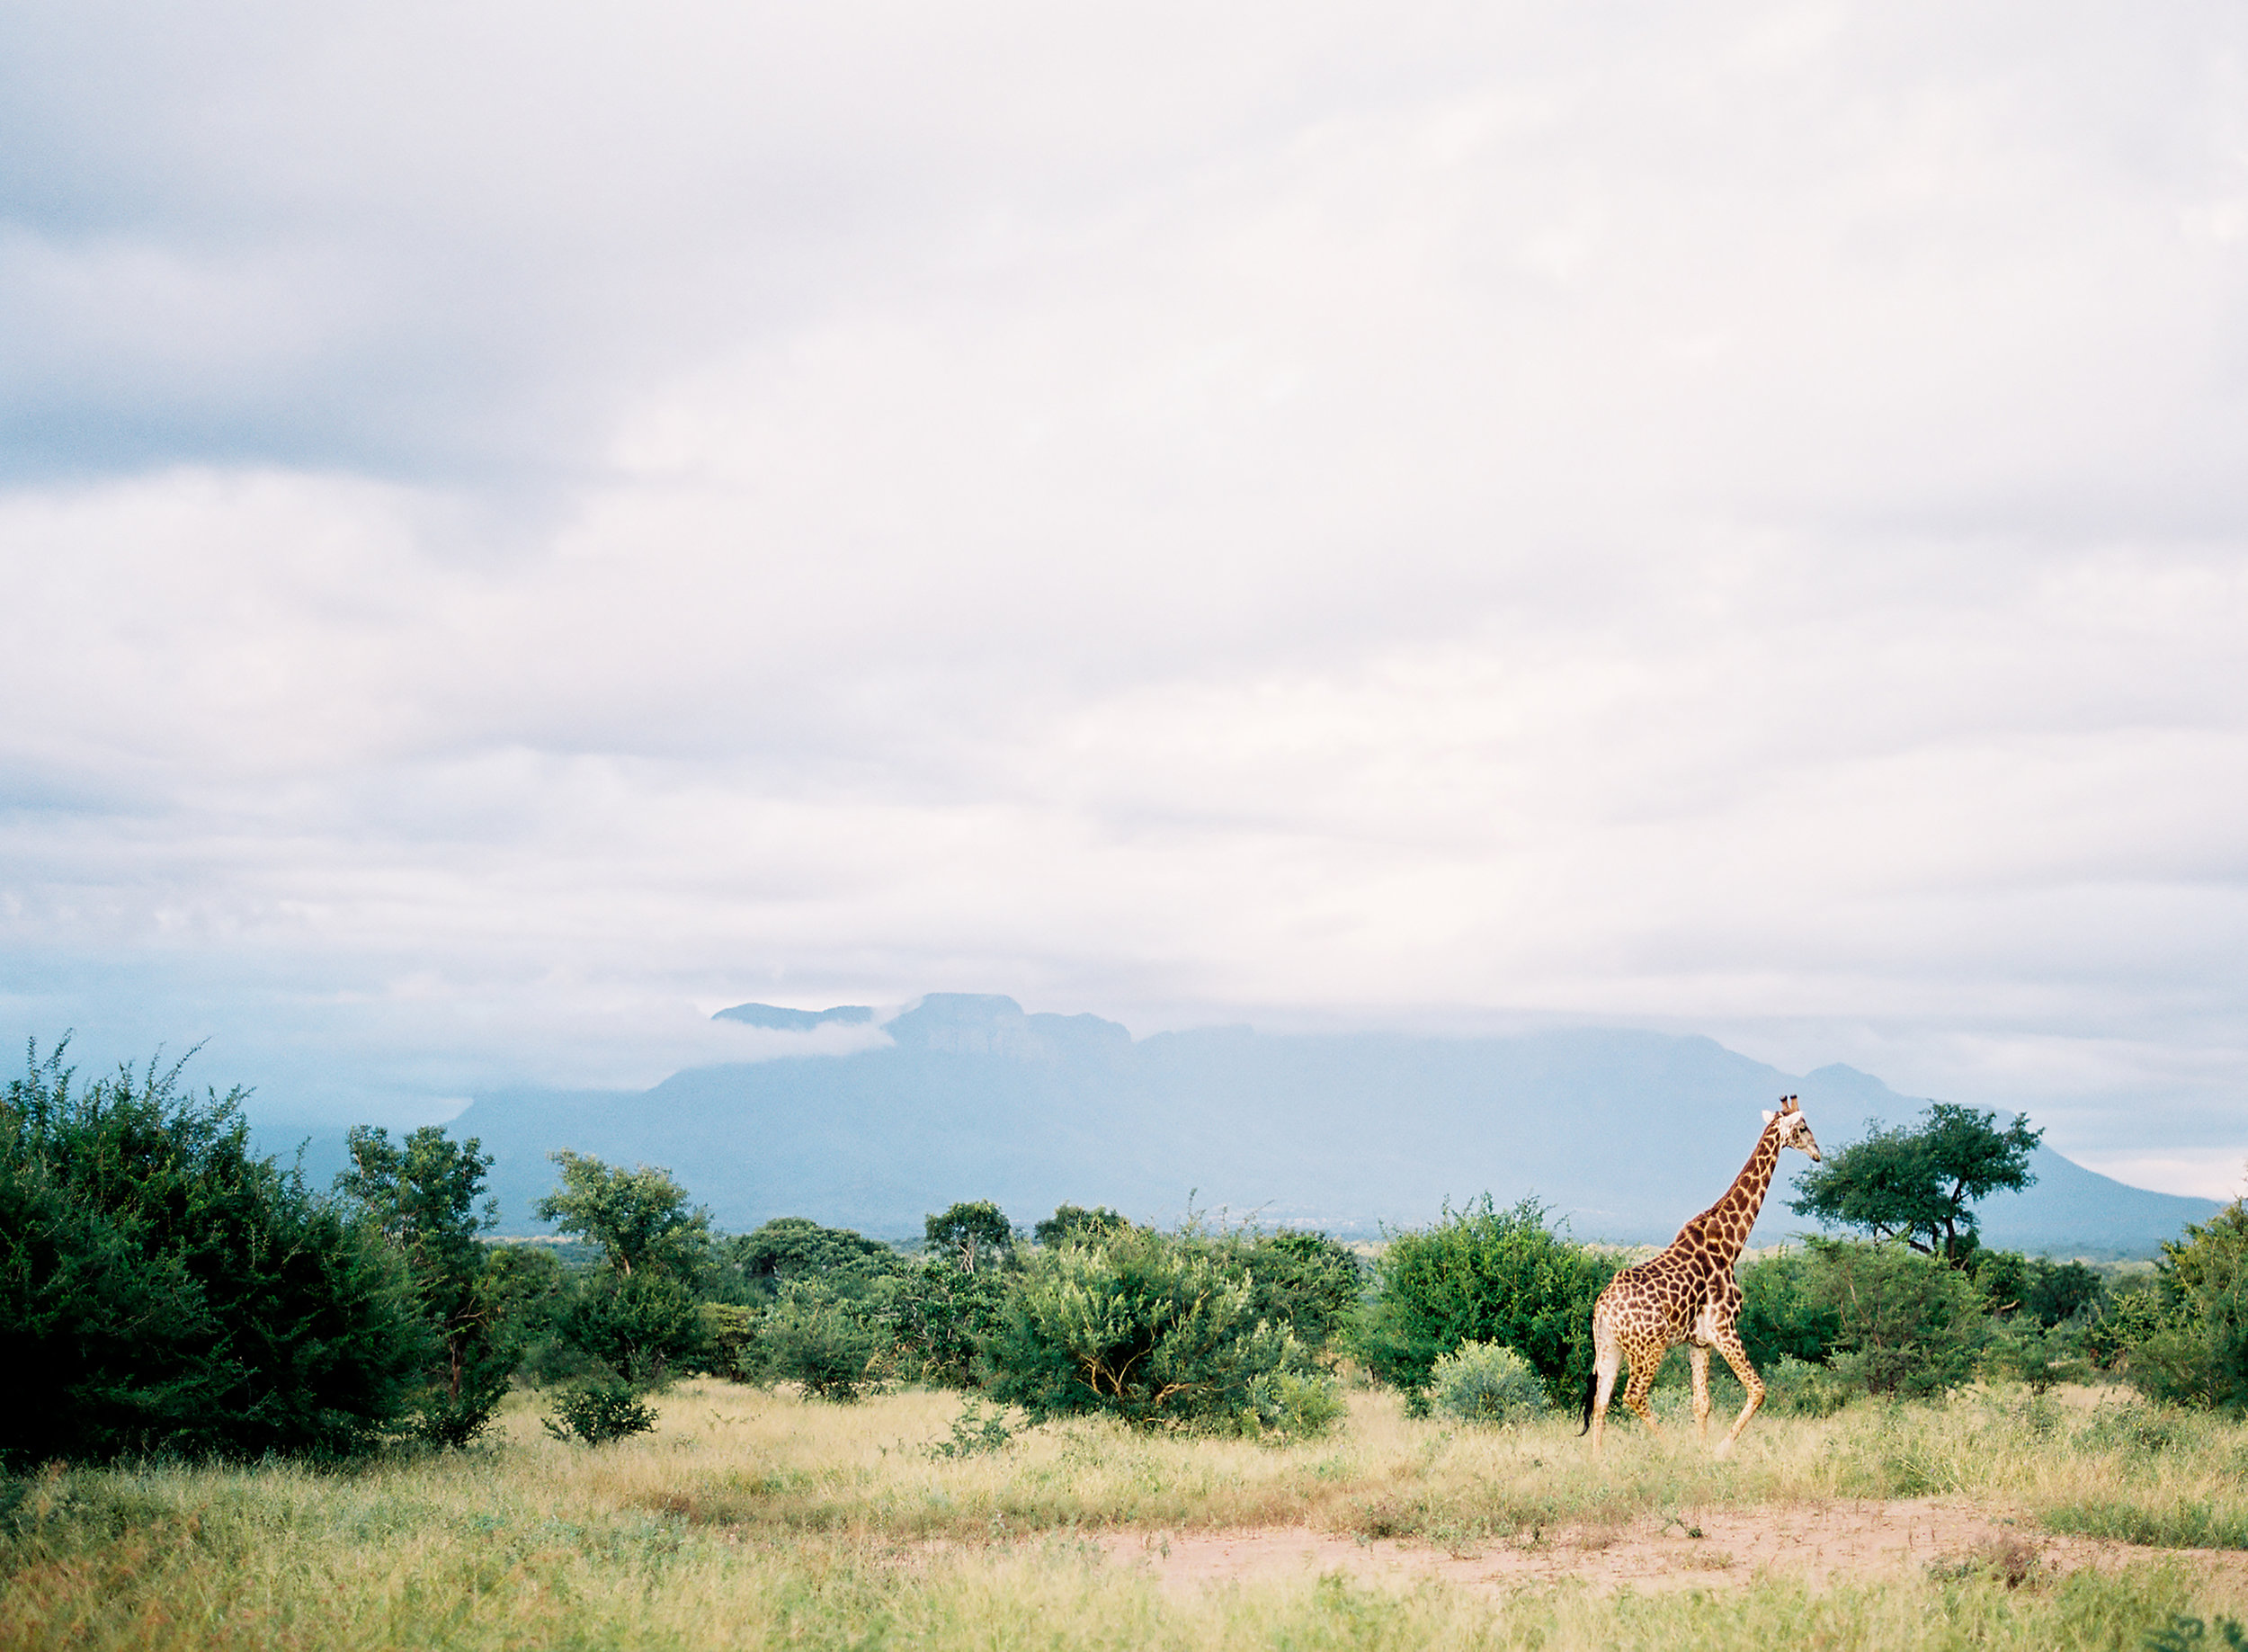 110_009631-R1-E027_AfricaFilm.jpg